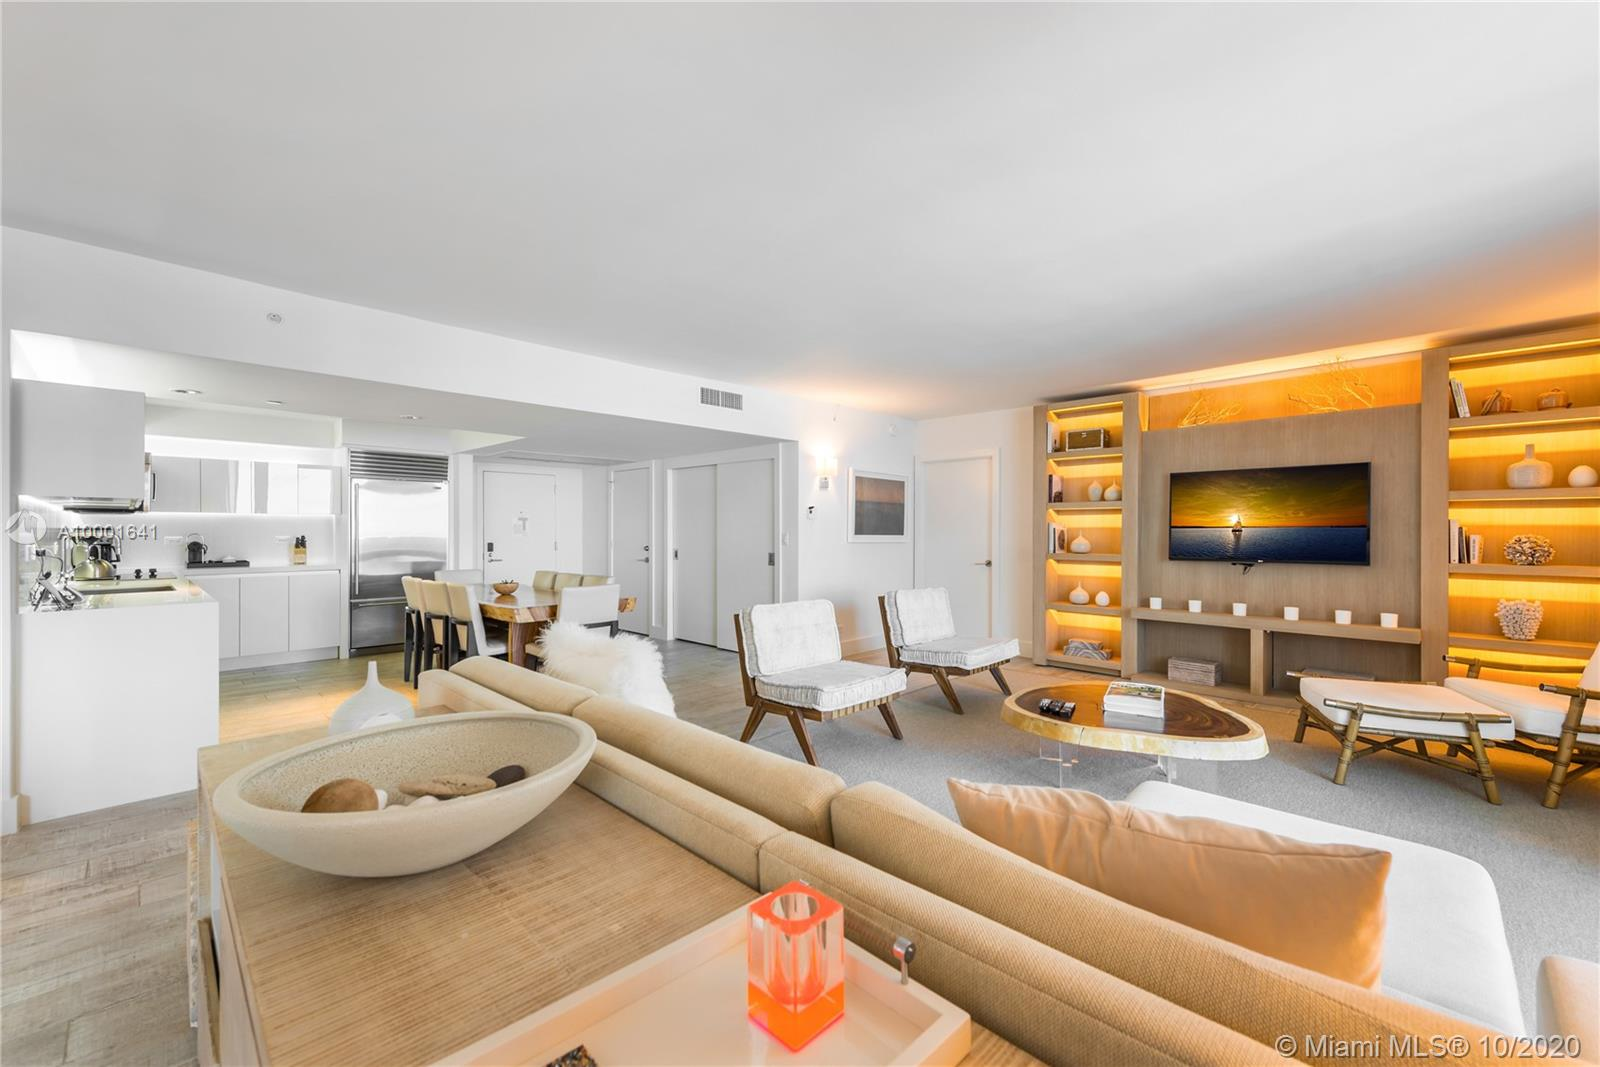 1 Hotel & Homes #1040 - 102 24 ST #1040, Miami Beach, FL 33139